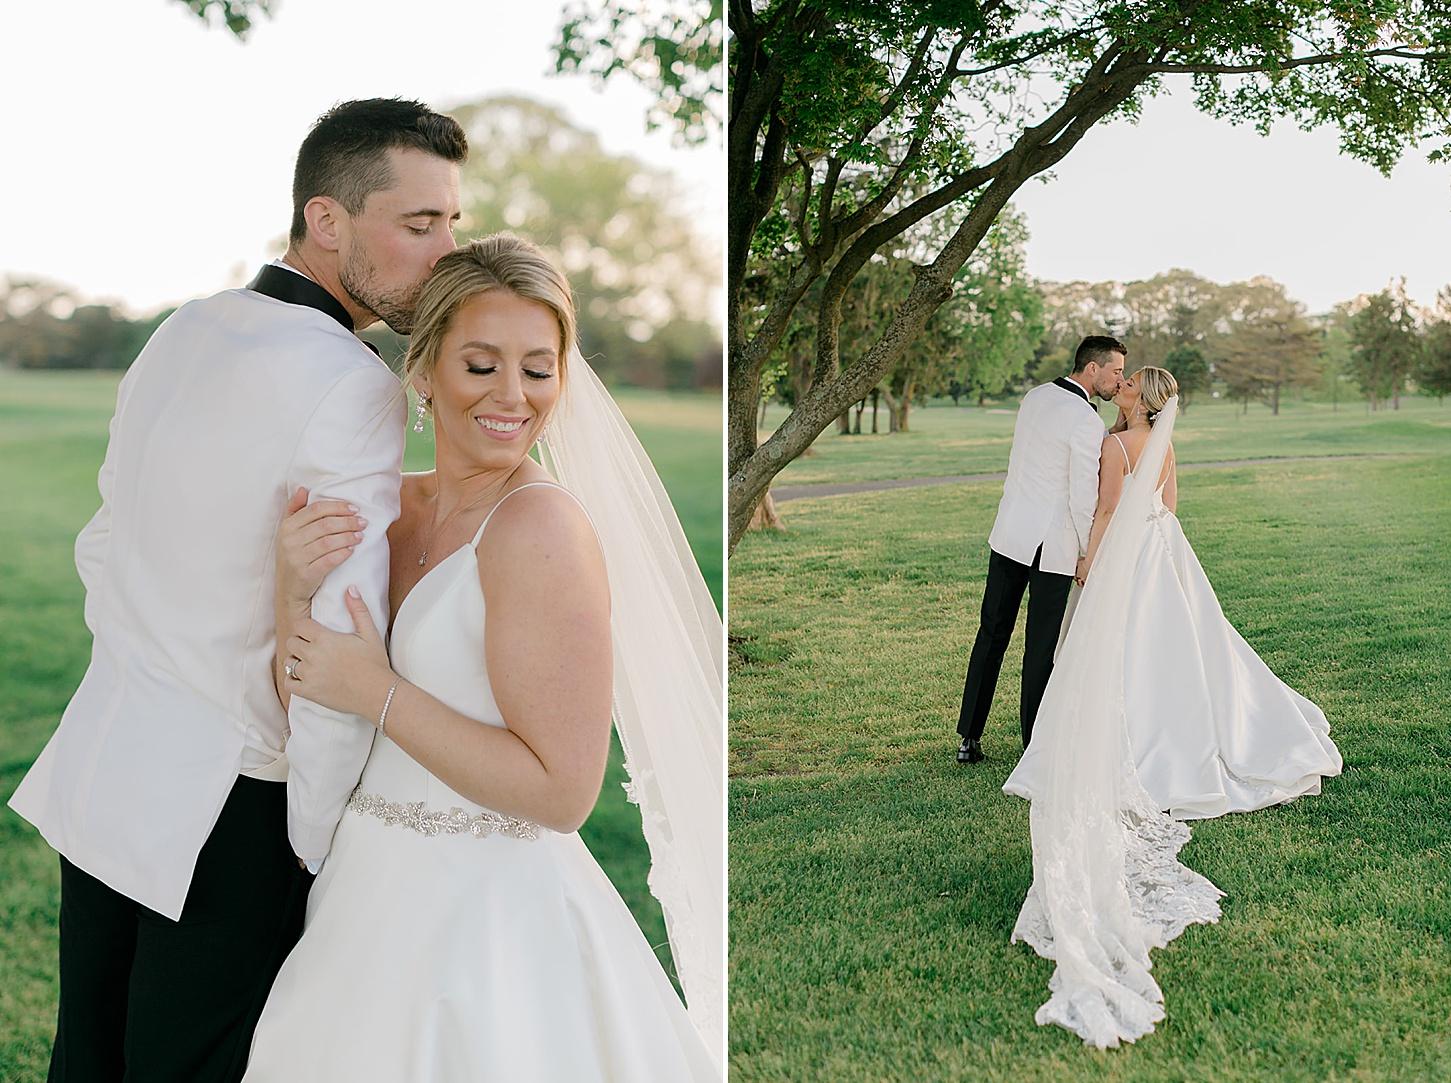 Linwood Country Club Summer Wedding Photography Studio by Magdalena Studios Jenn Kyle 0049